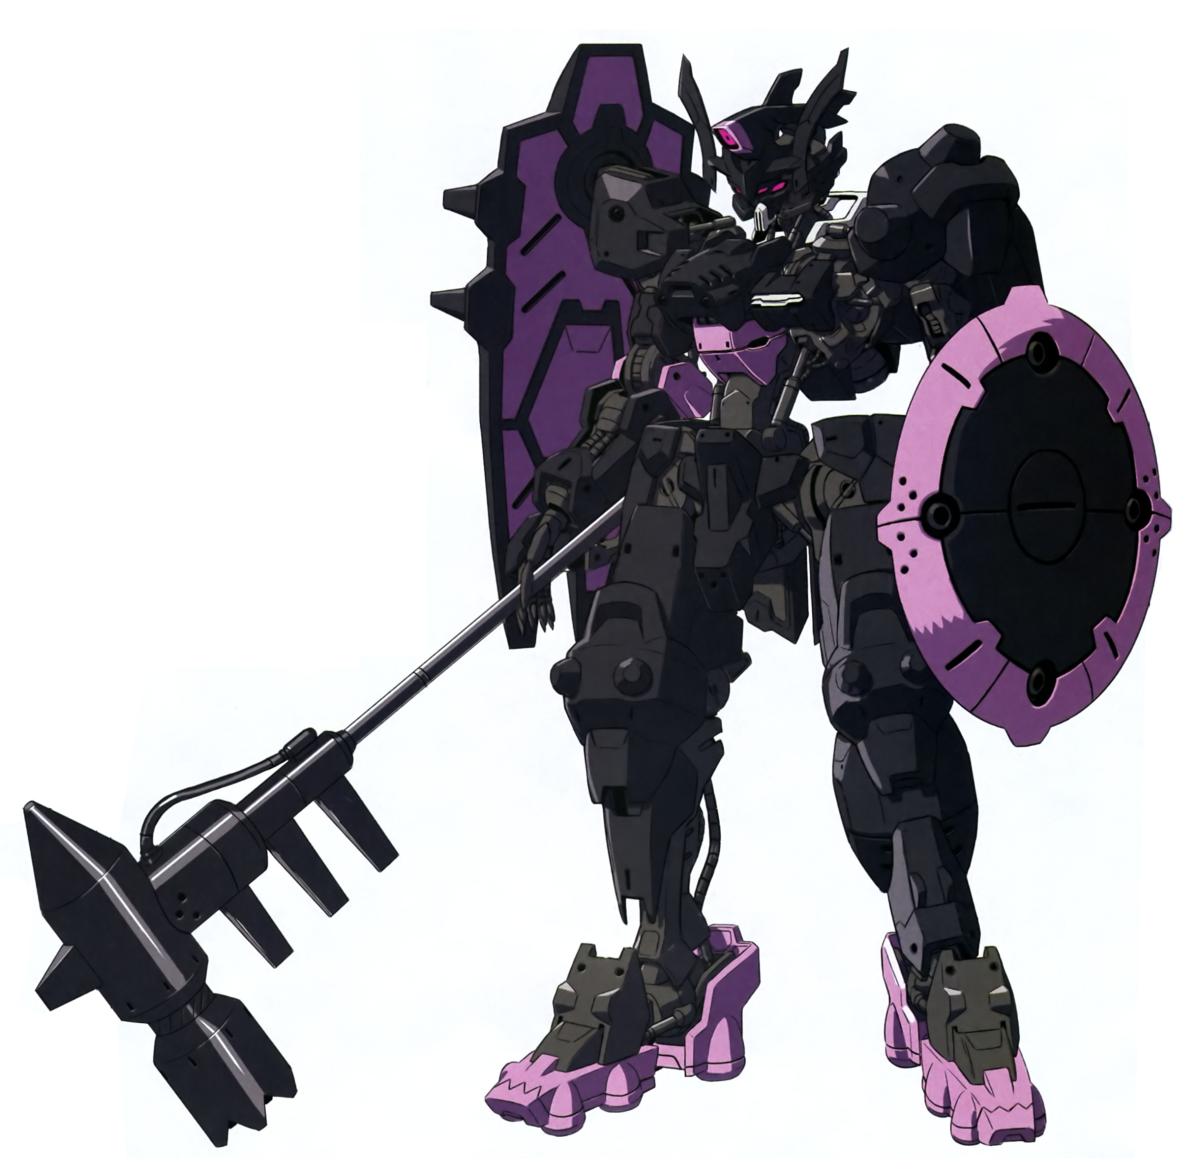 Even more darker than the Astaroth Origin.